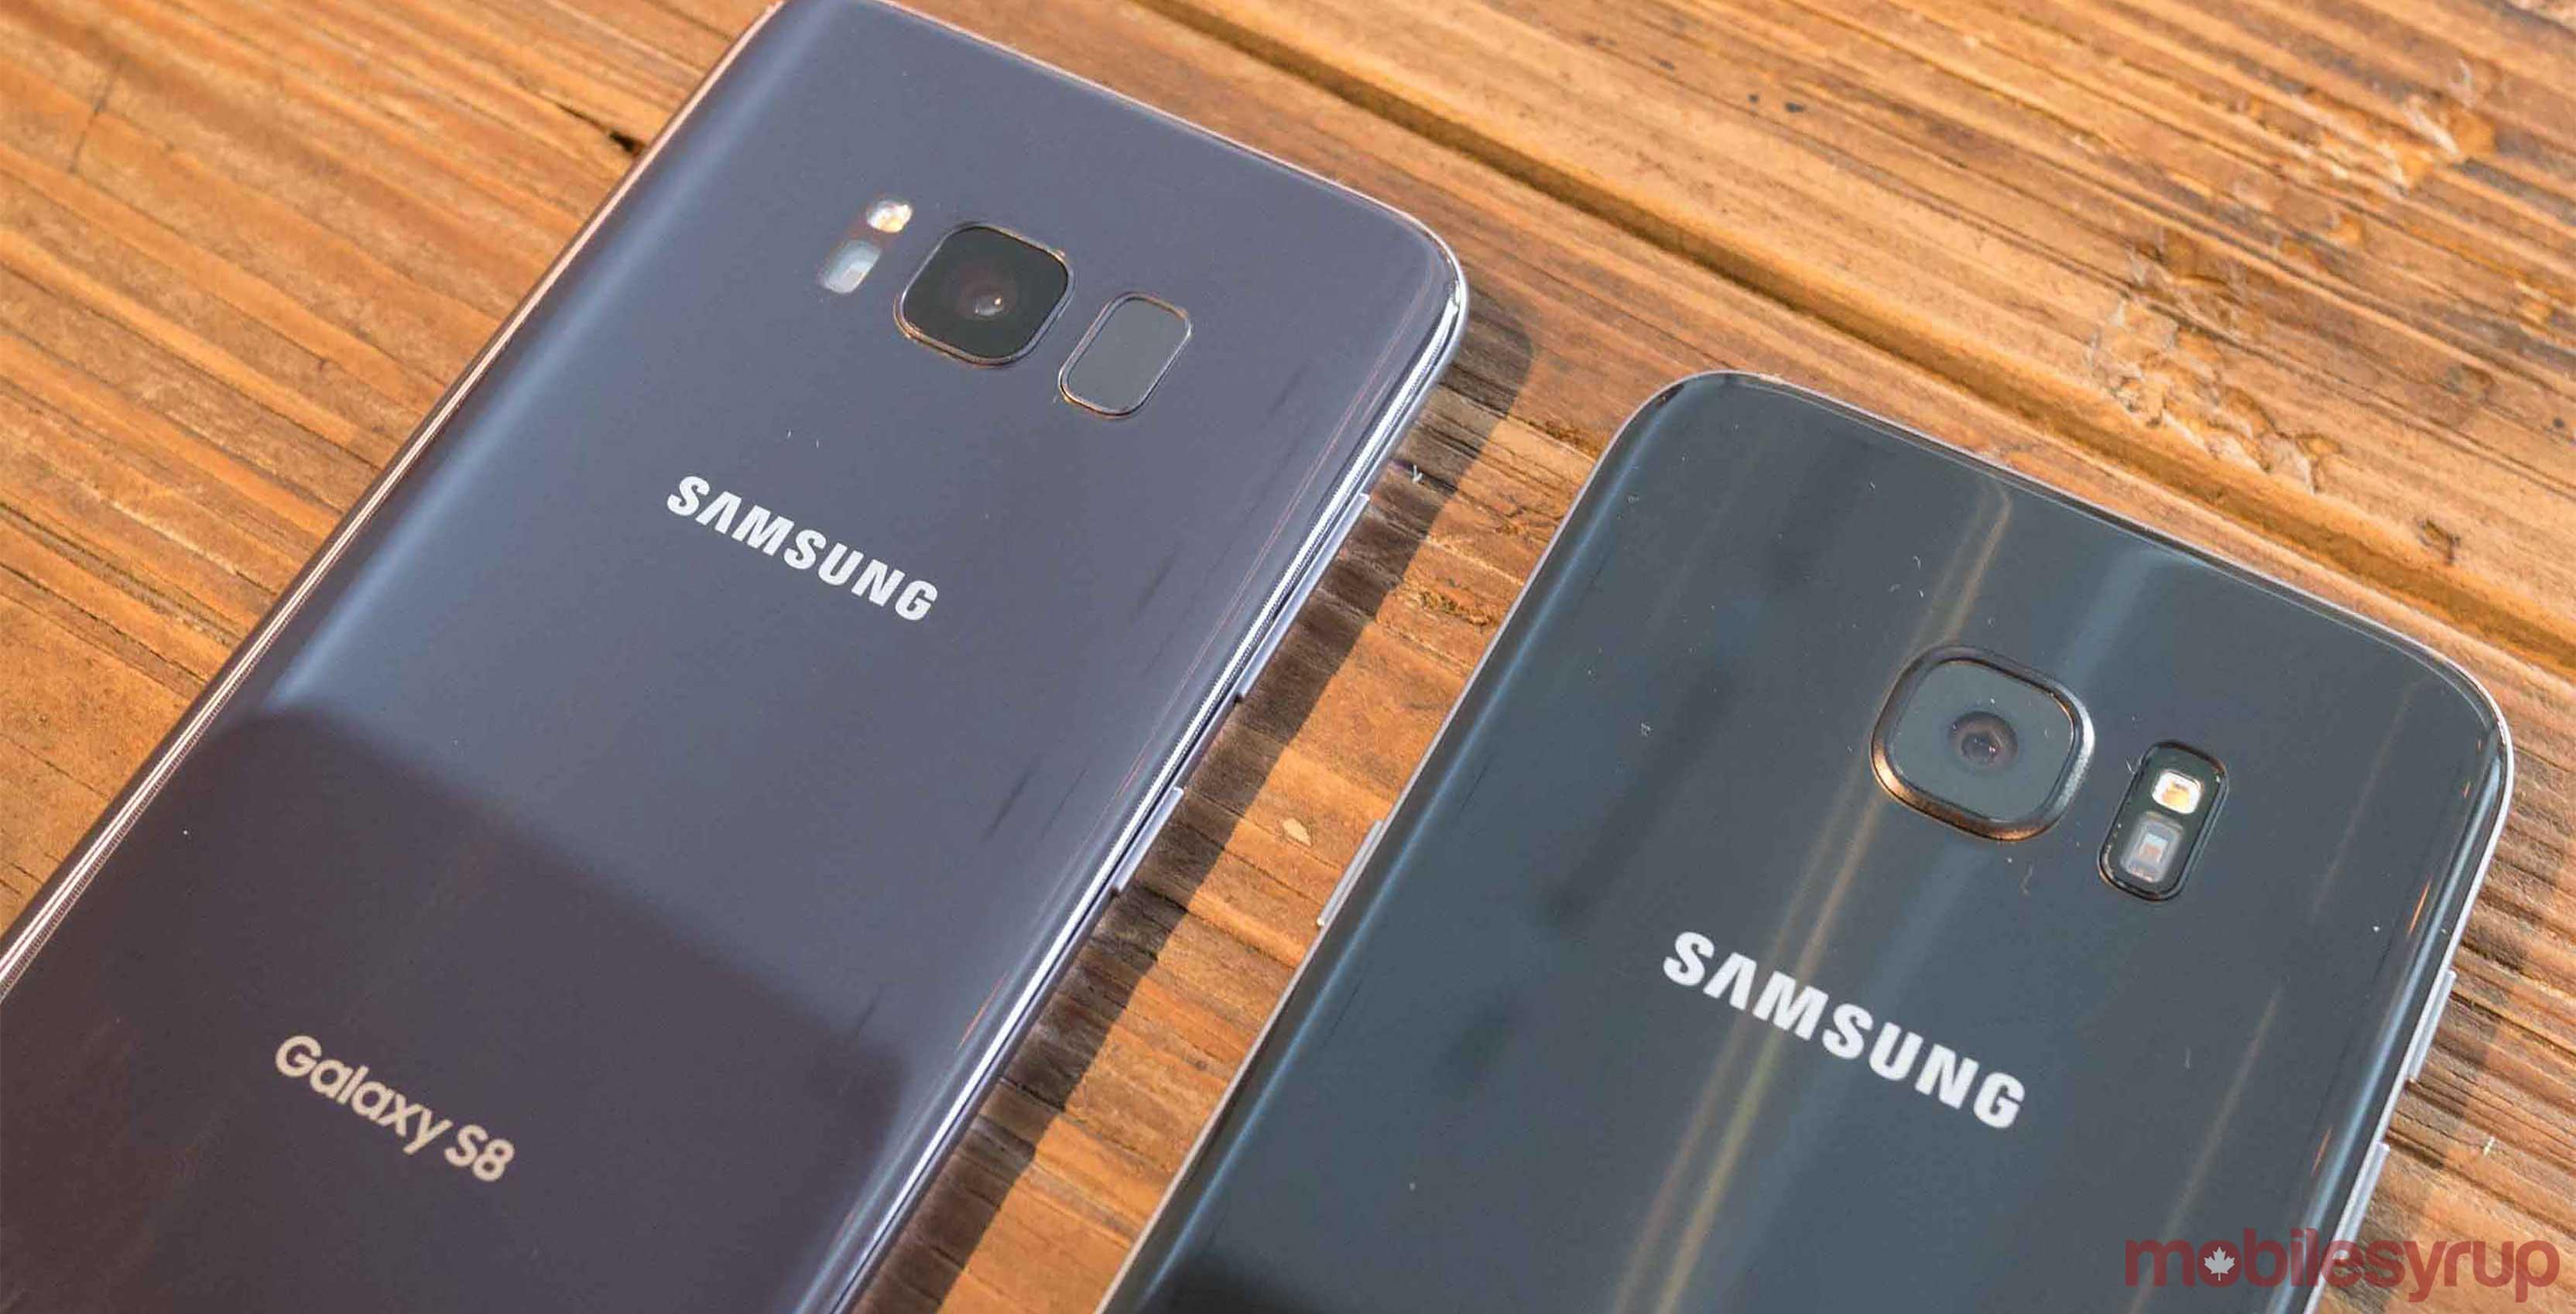 Comparison of Galaxy S8 vs Galaxy S7 smartphones